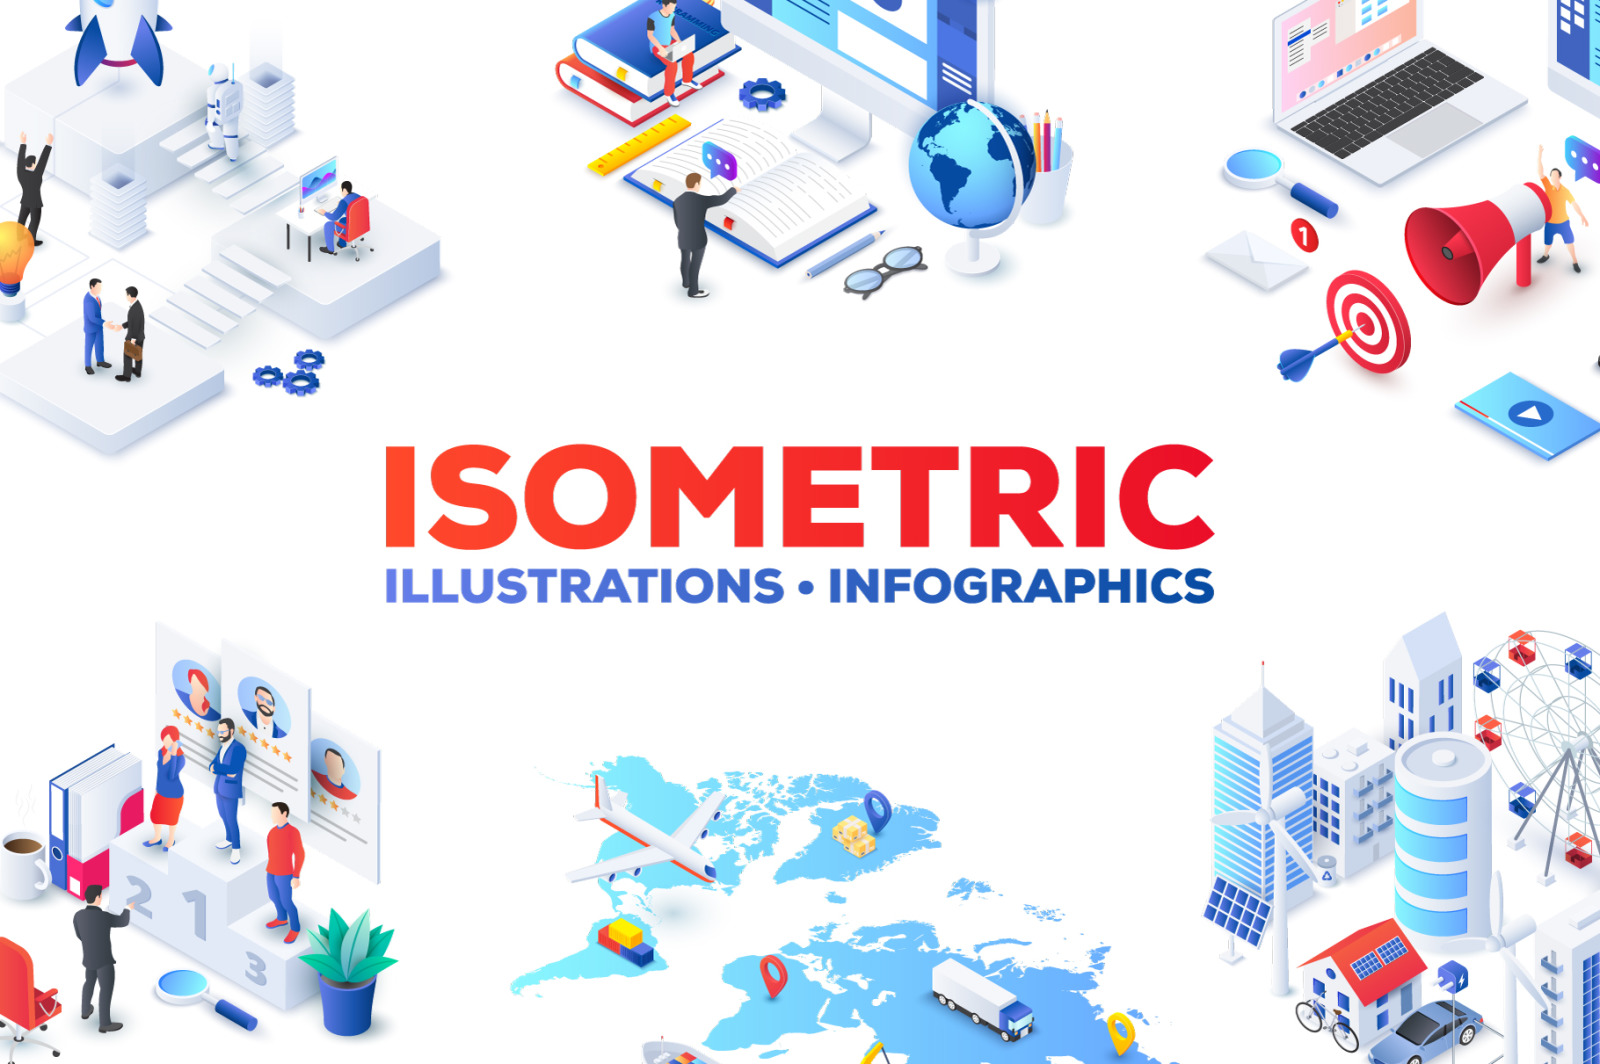 Isometric illustrations templates